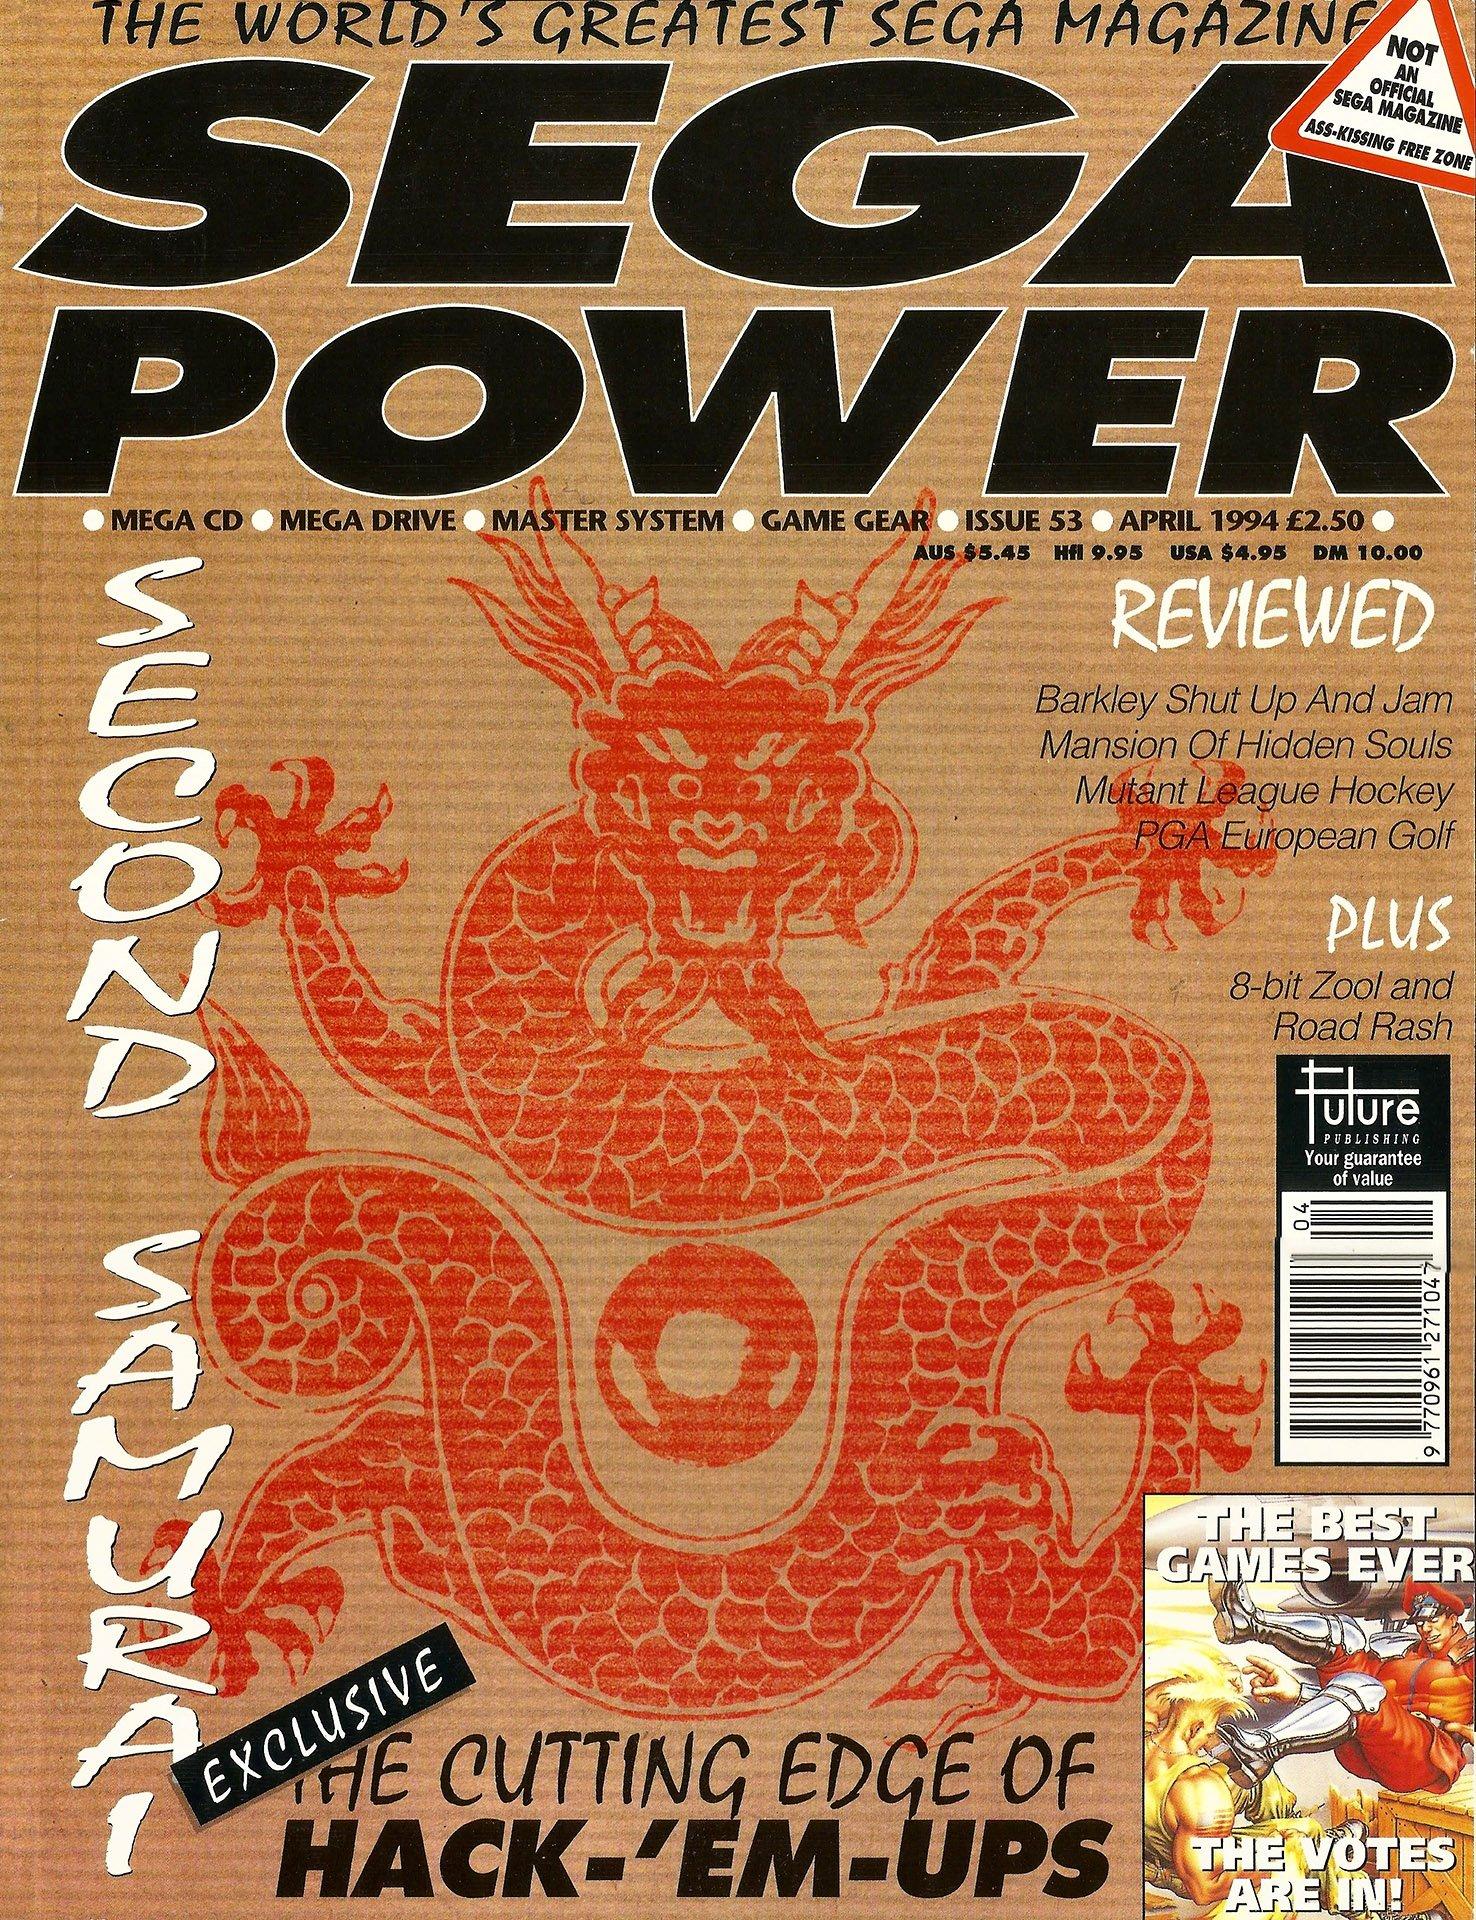 Sega Power Issue 53 (April 1994)